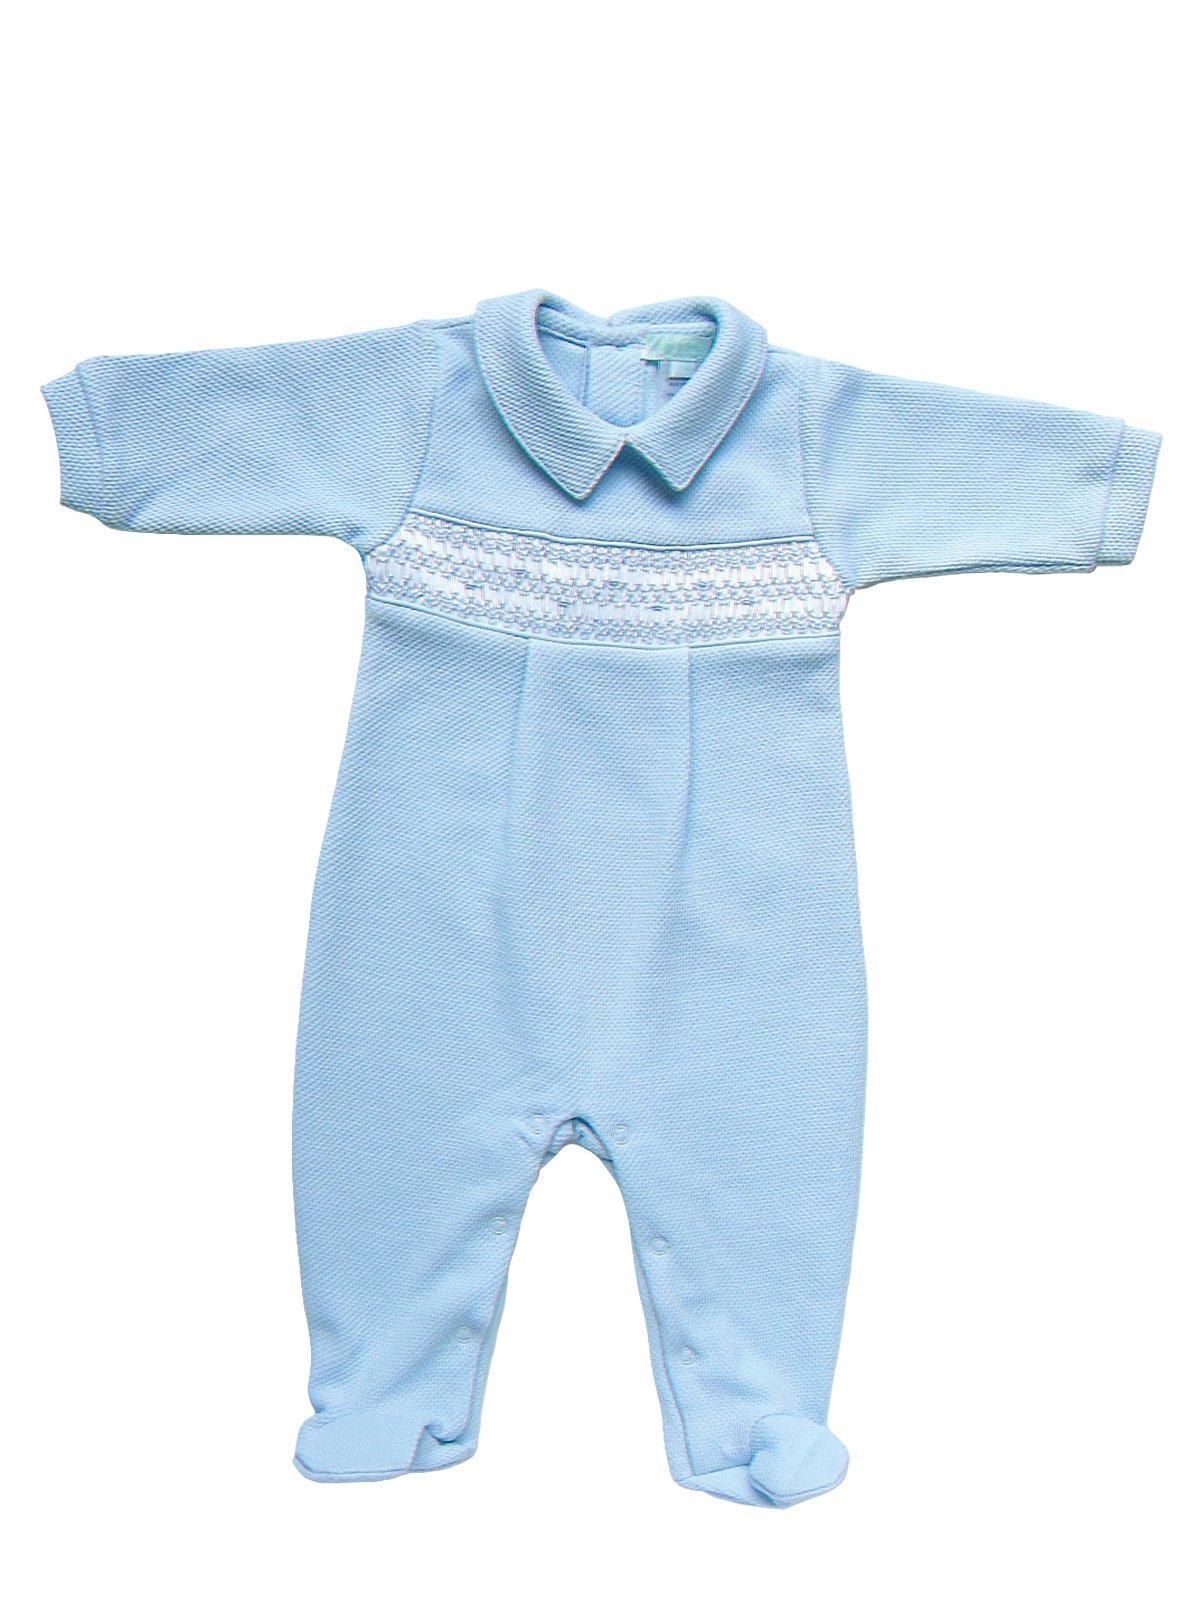 a75a11e9c9d6 Kieran - Piqué Smocked Jumpsuit - Baby - Schweitzer Linen